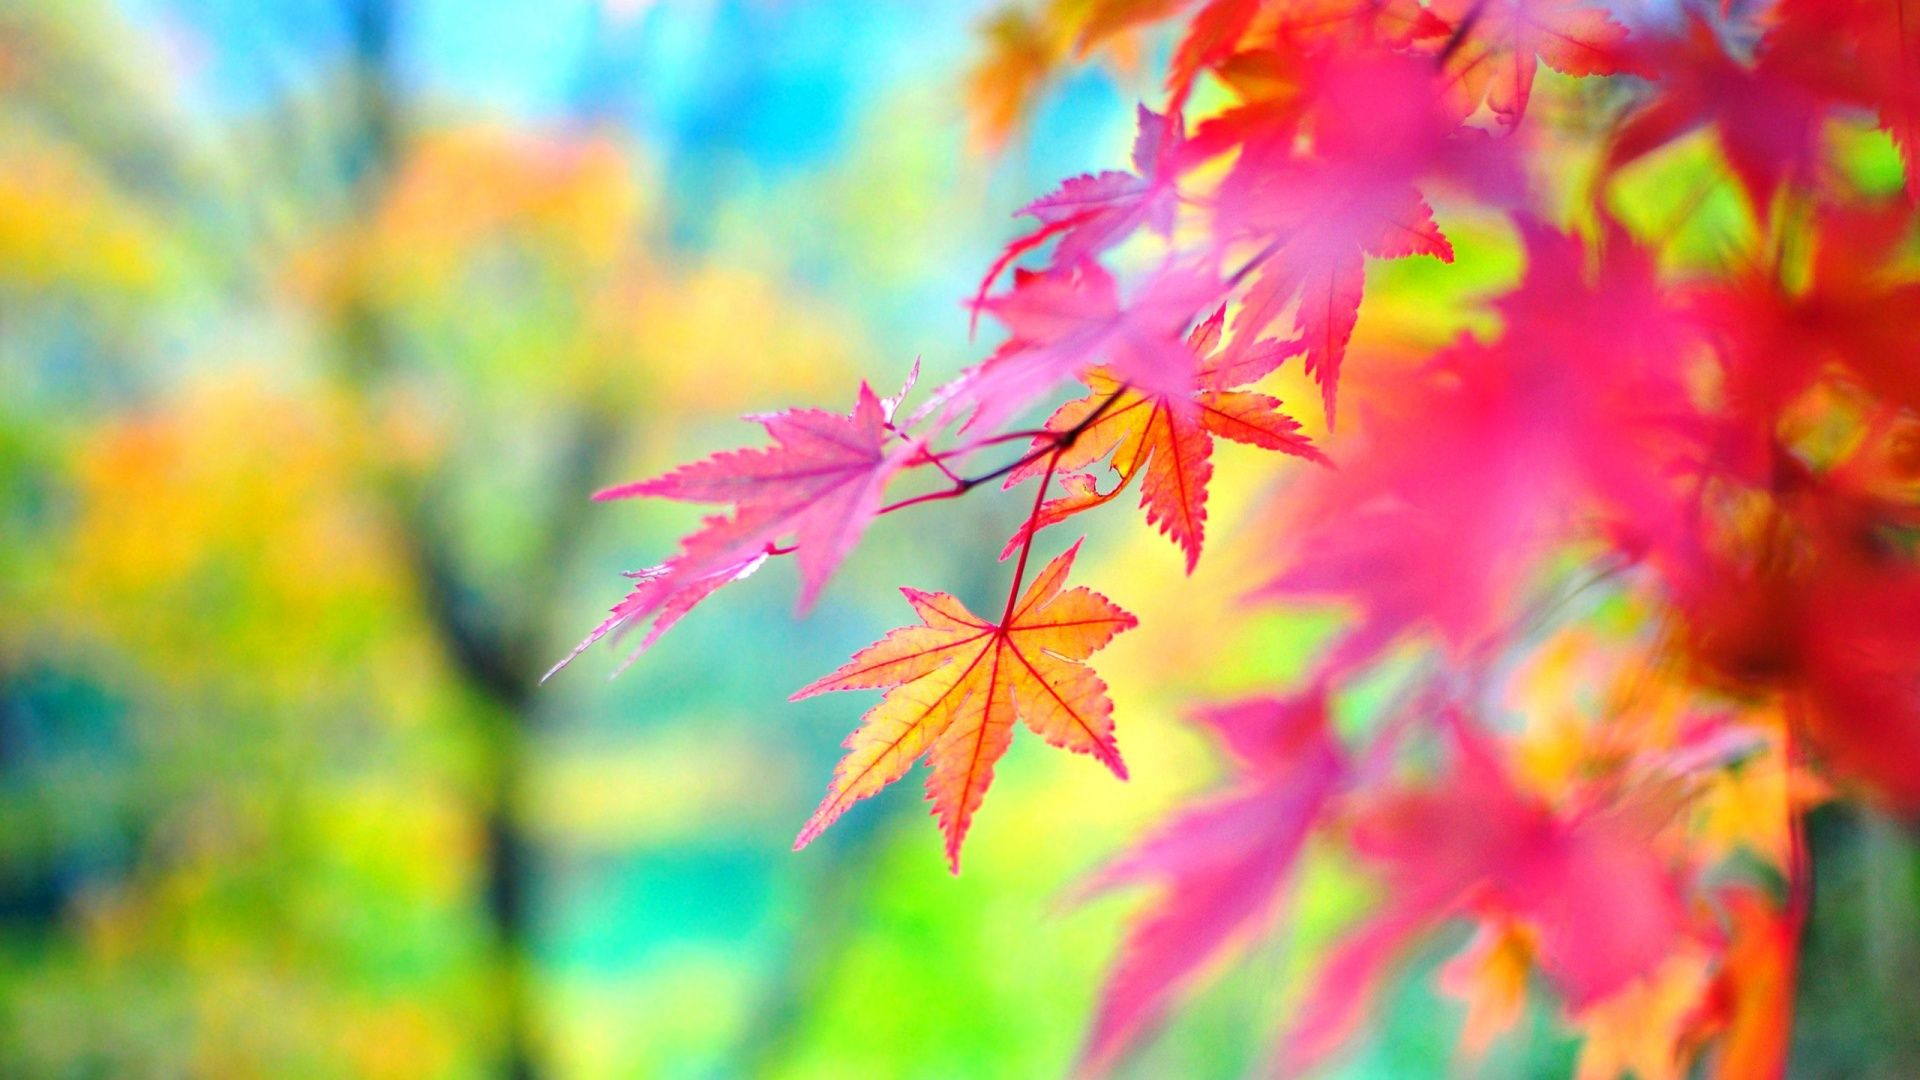 Colorful Nature Wallpaper